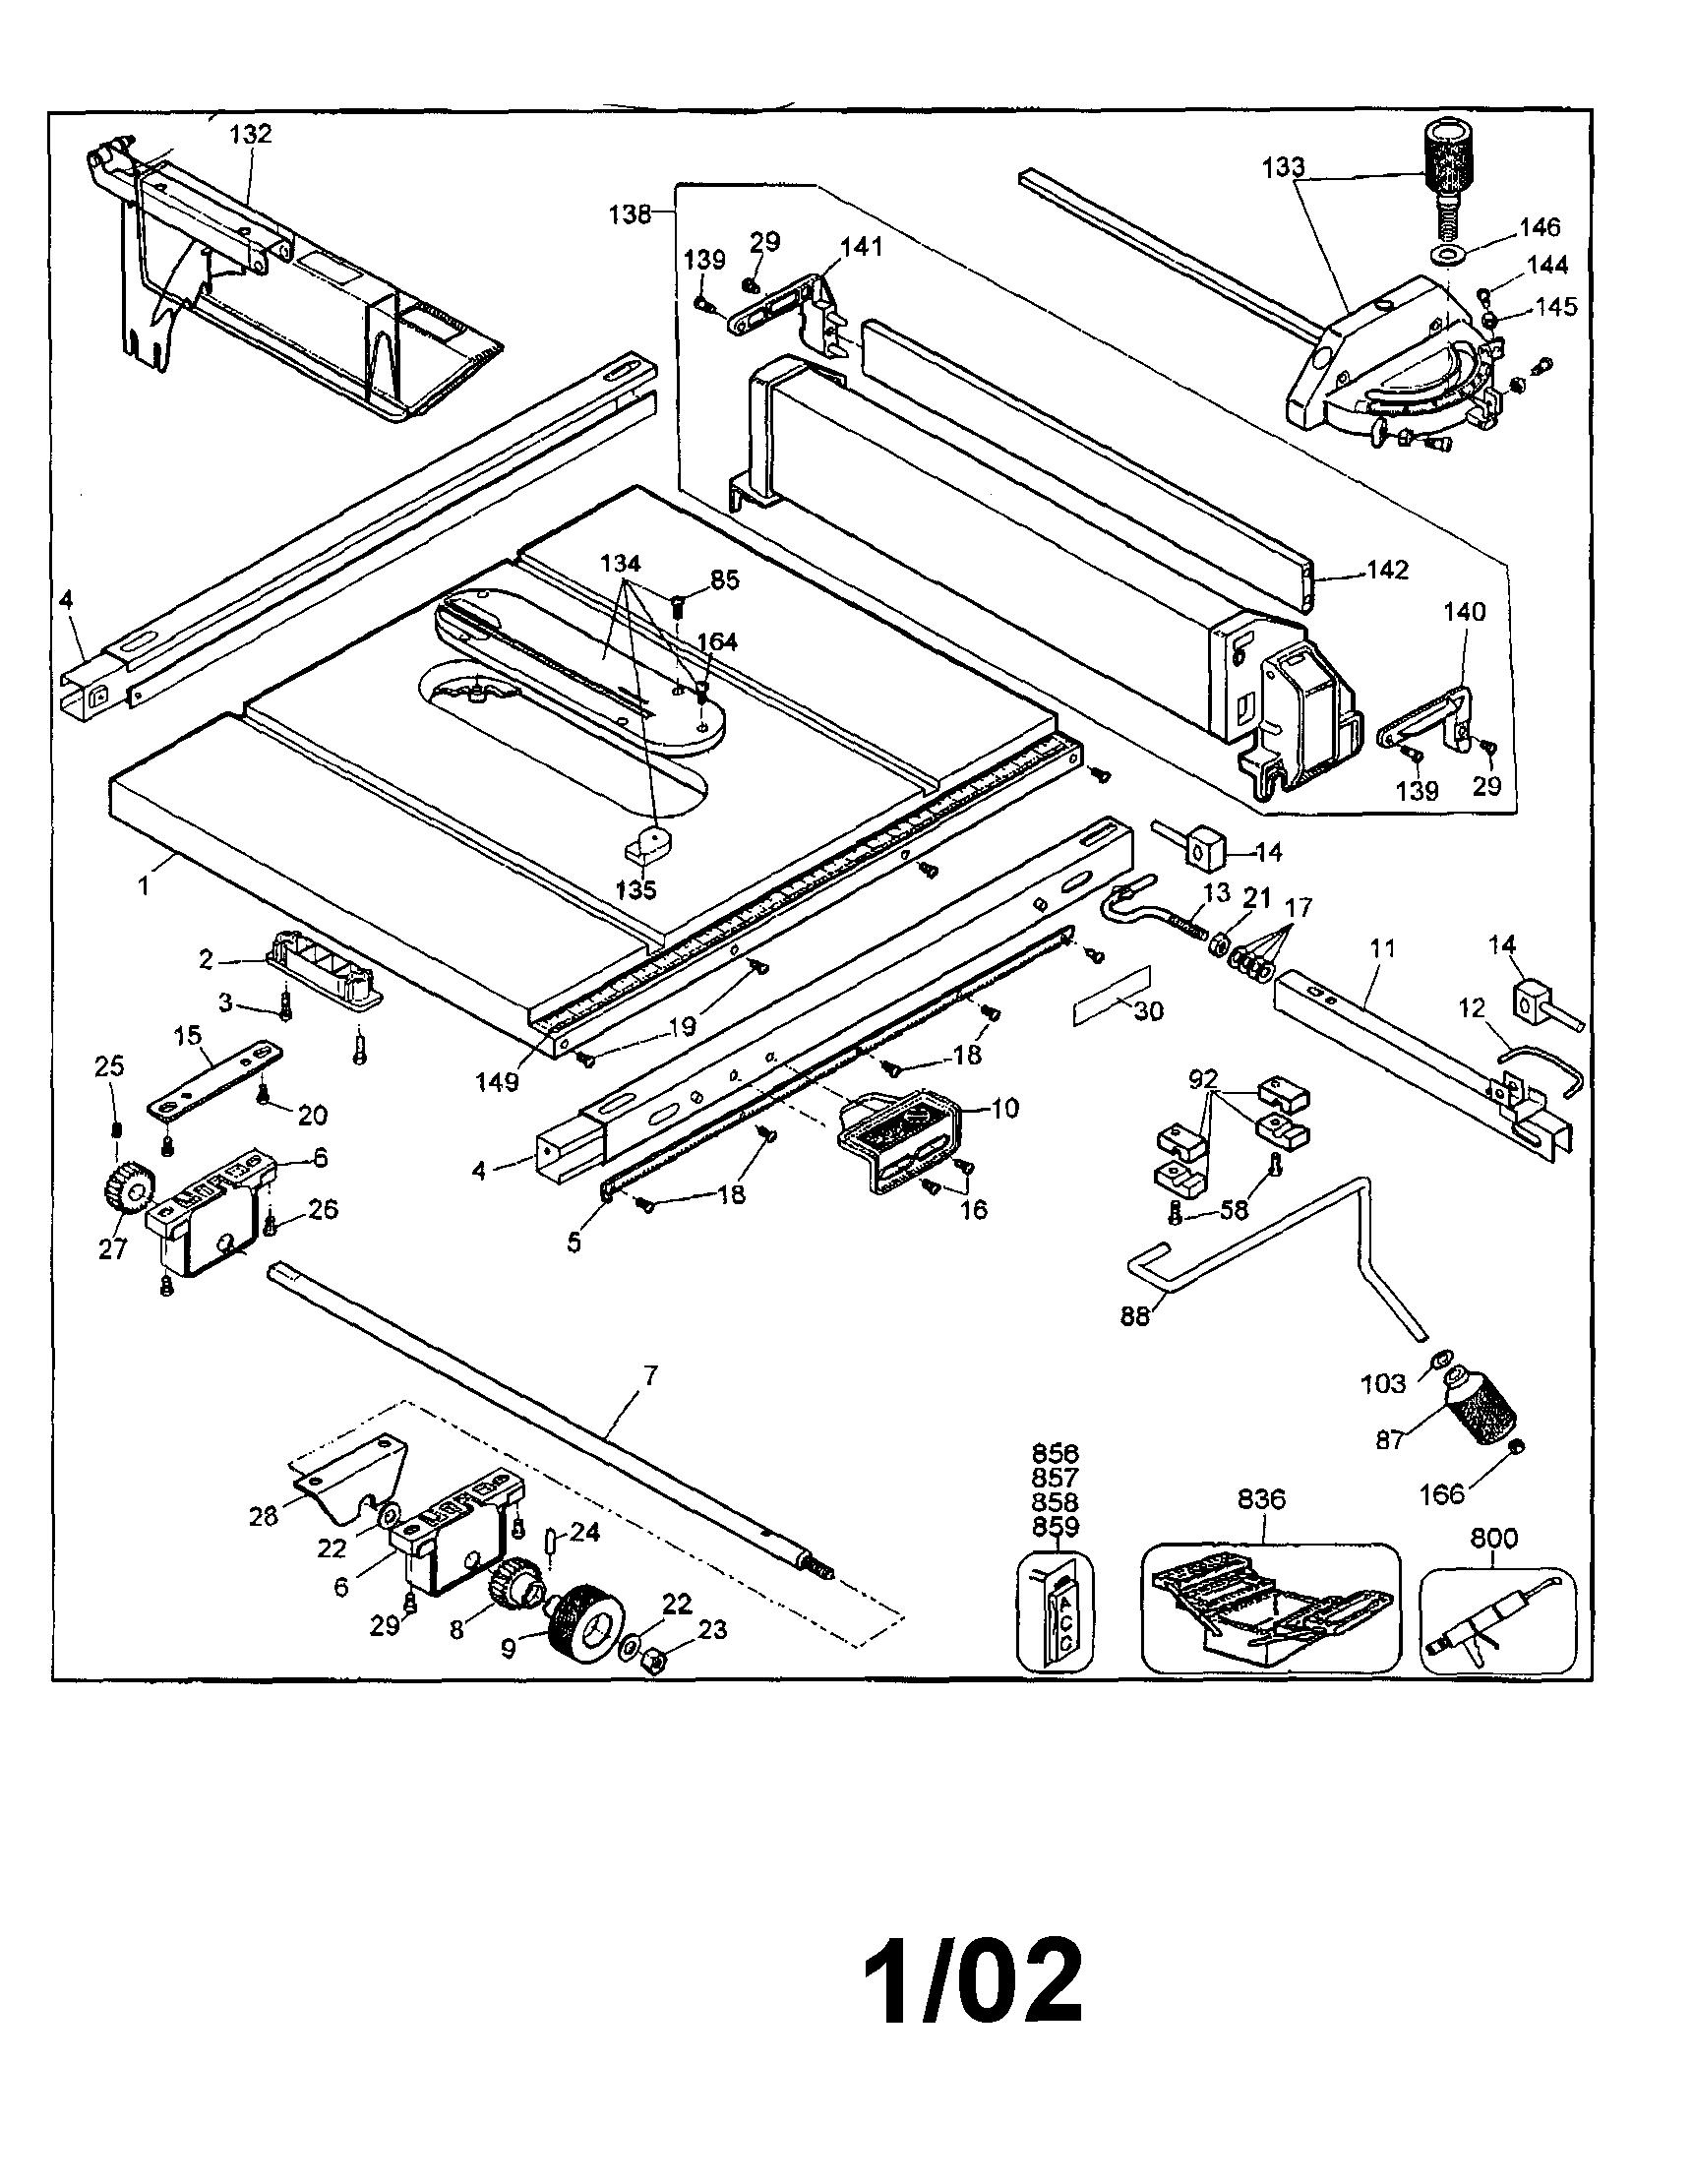 Dewalt Dw124 Wiring Diagram : 27 Wiring Diagram Images